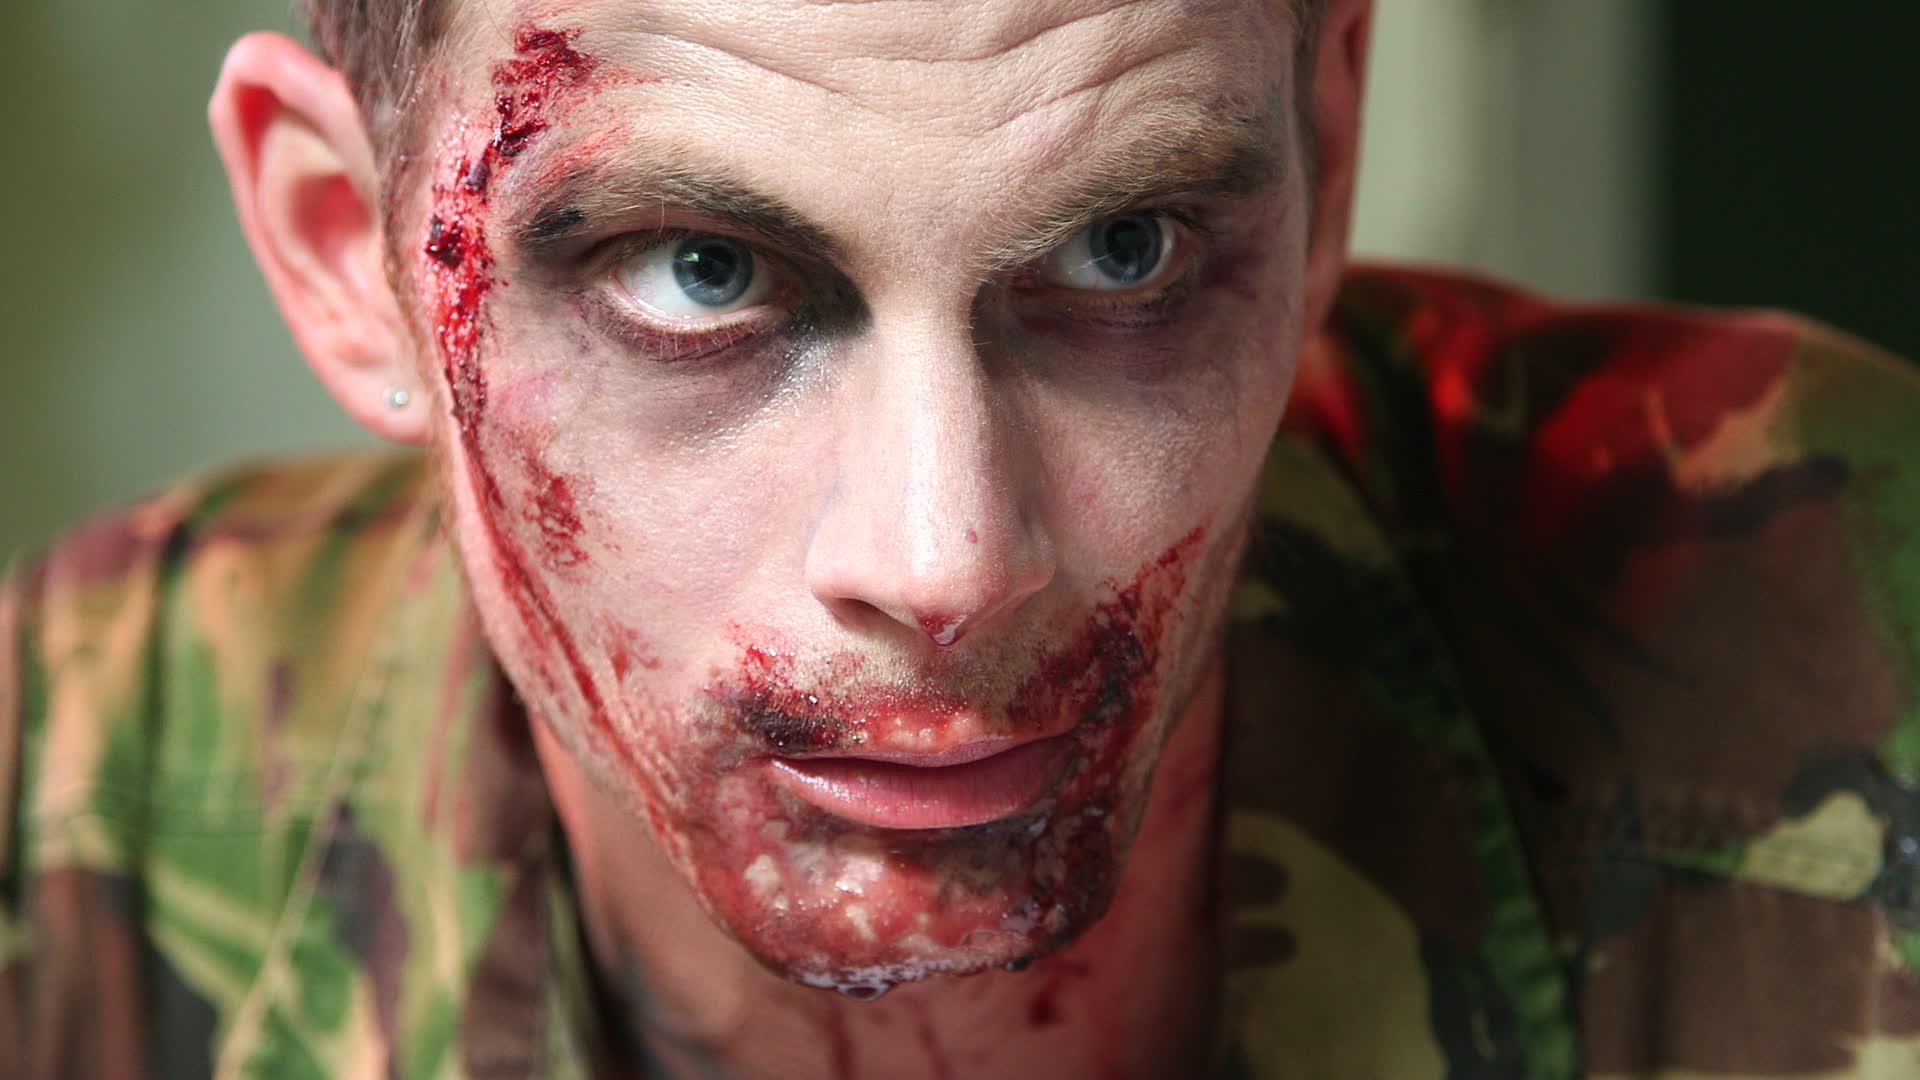 Dan Pearce Abjection Zombie